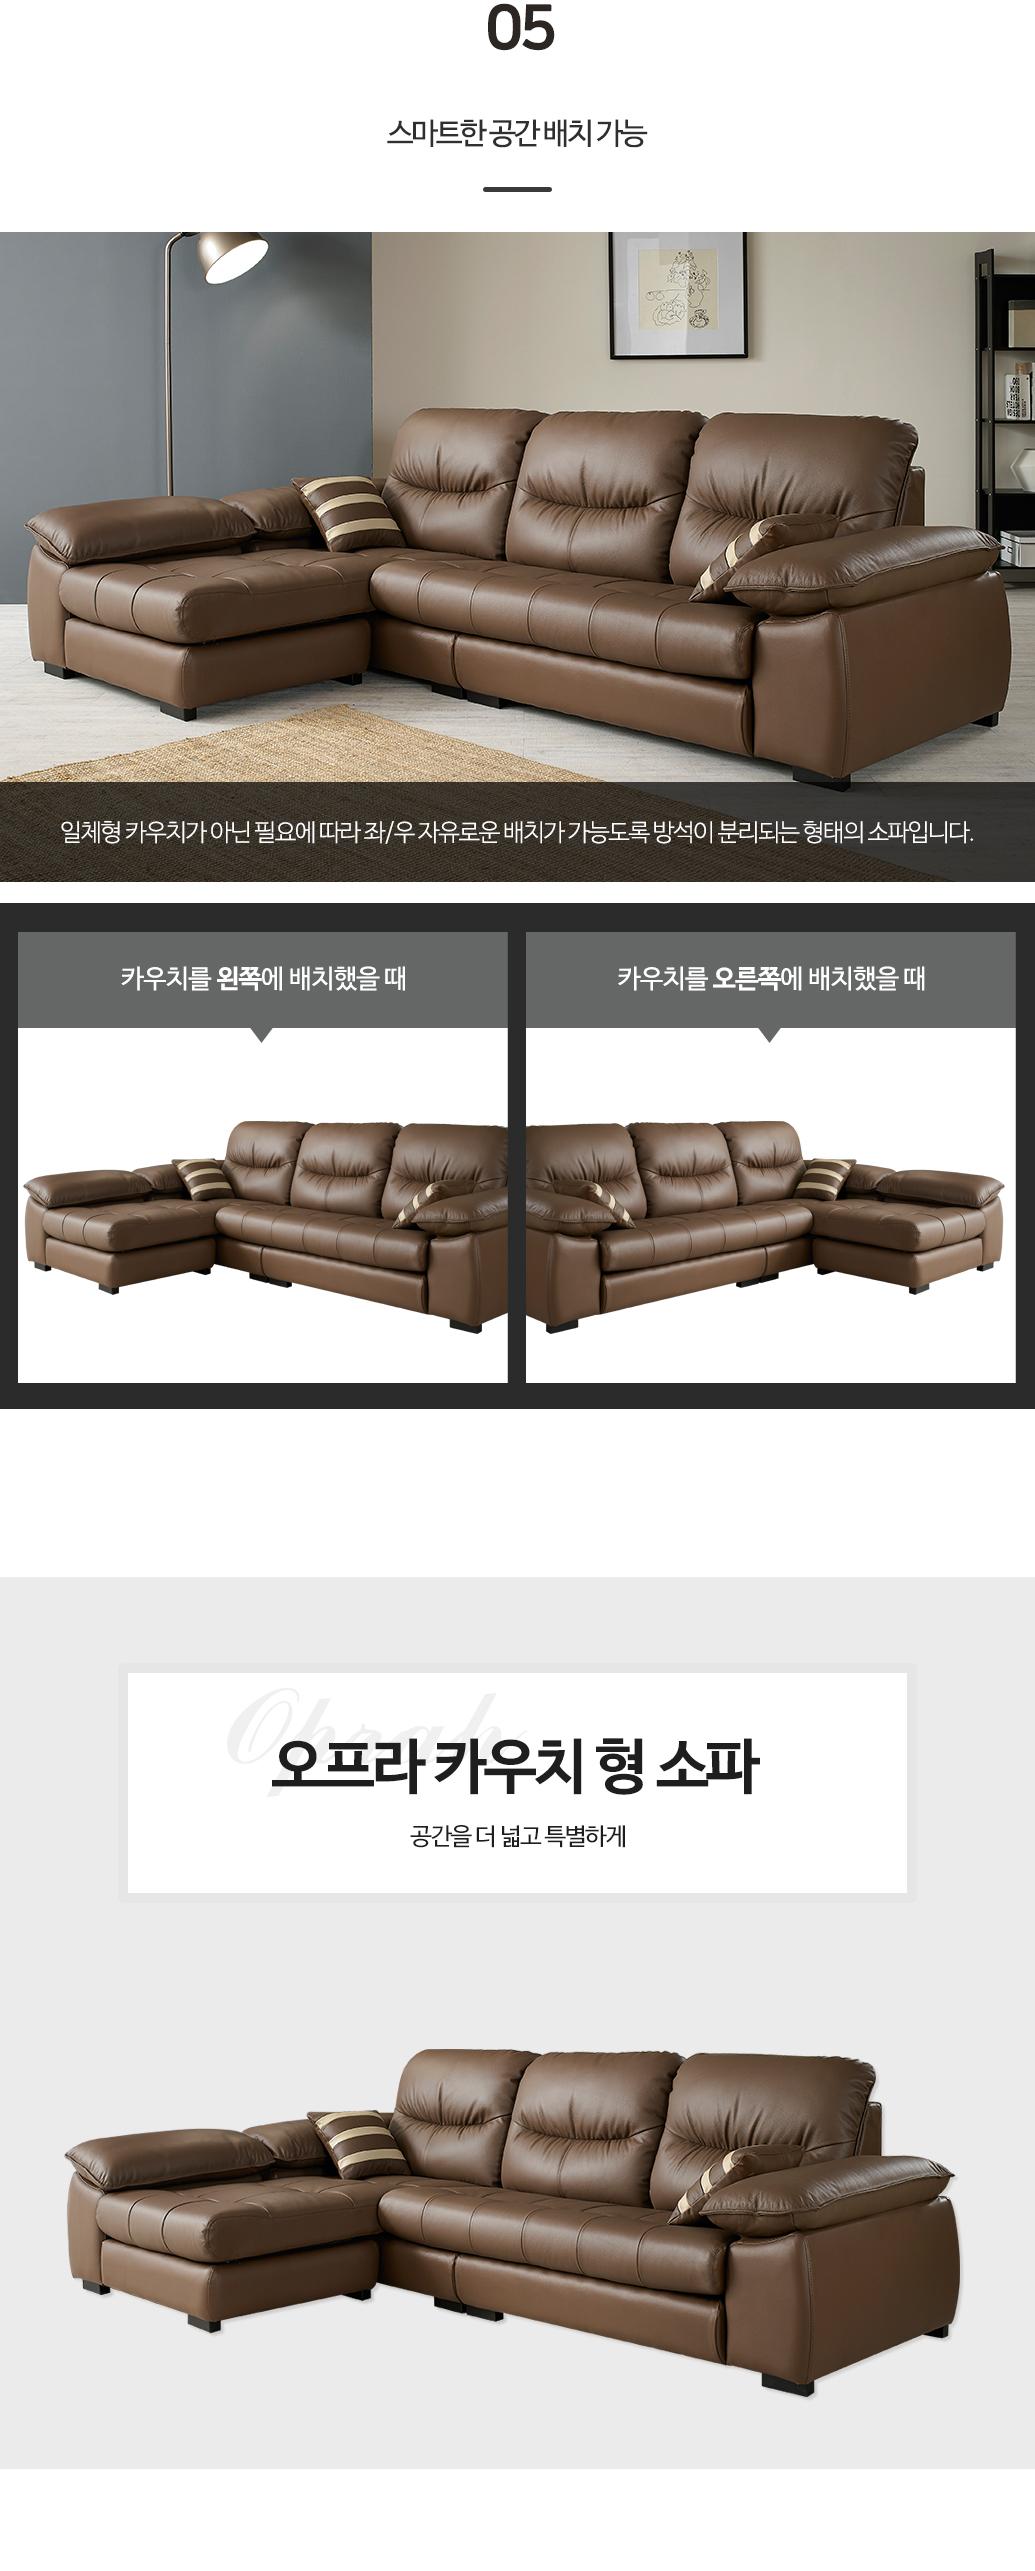 gr_oprah_couch07.jpg